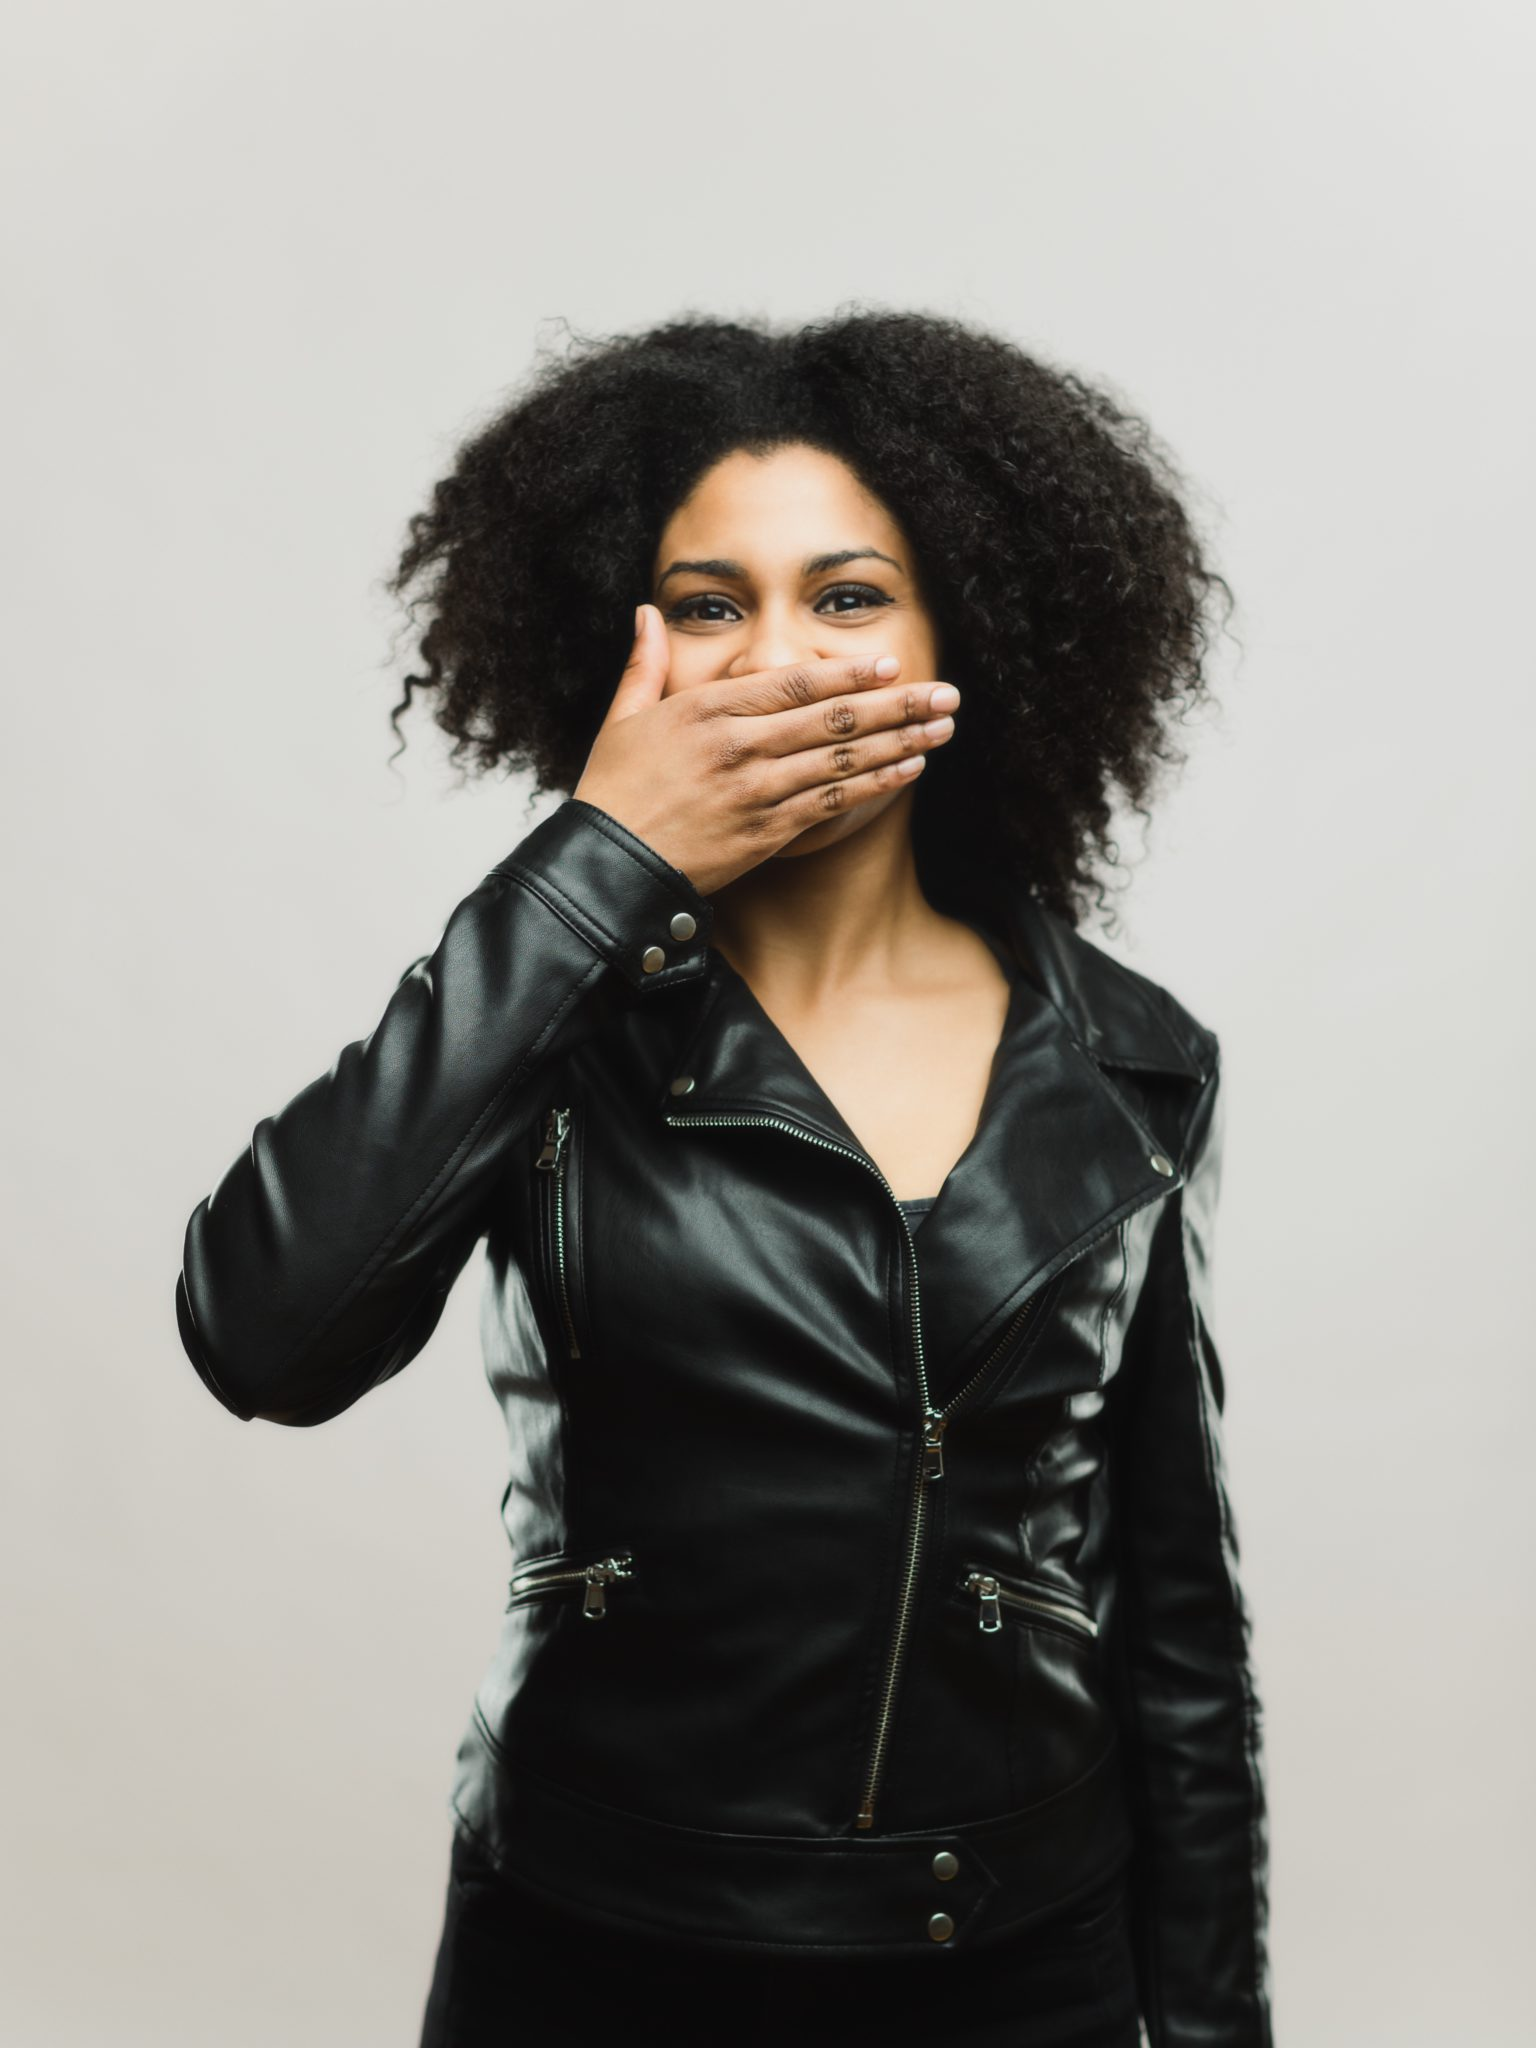 dental fear and dentist anxiety